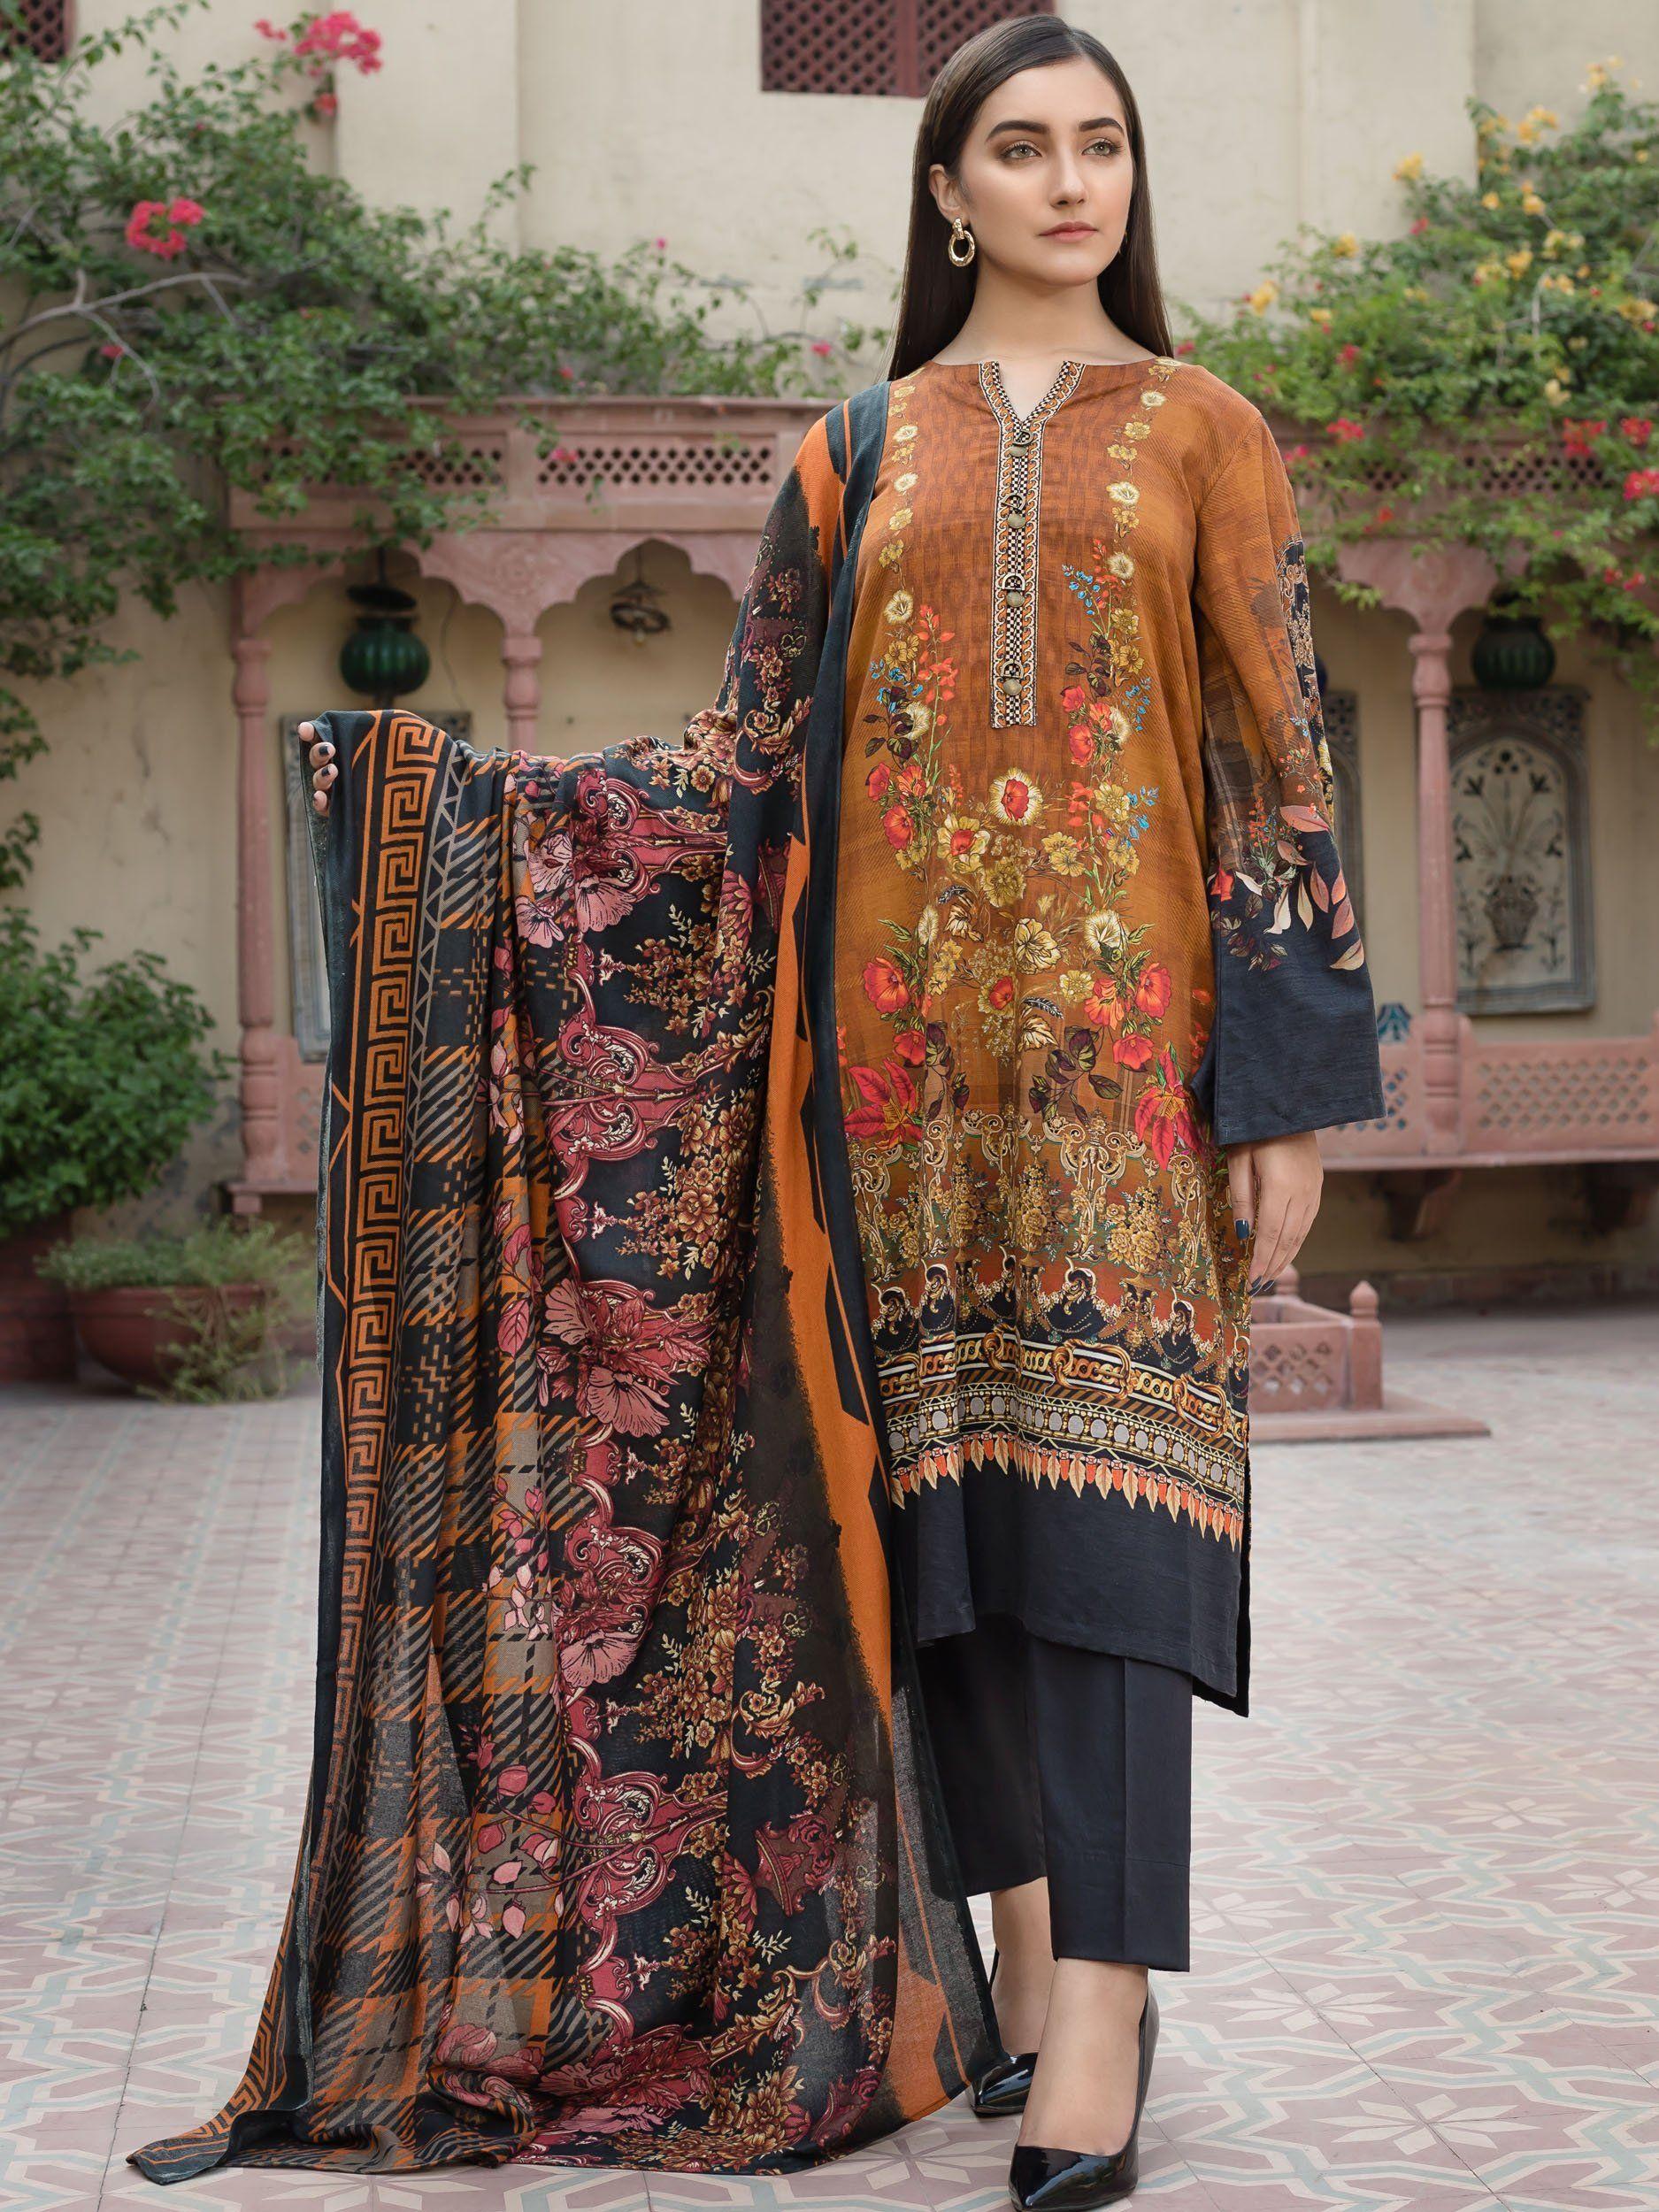 Pakistani//Indian Winter Velvet 2pc Salwar Kameez